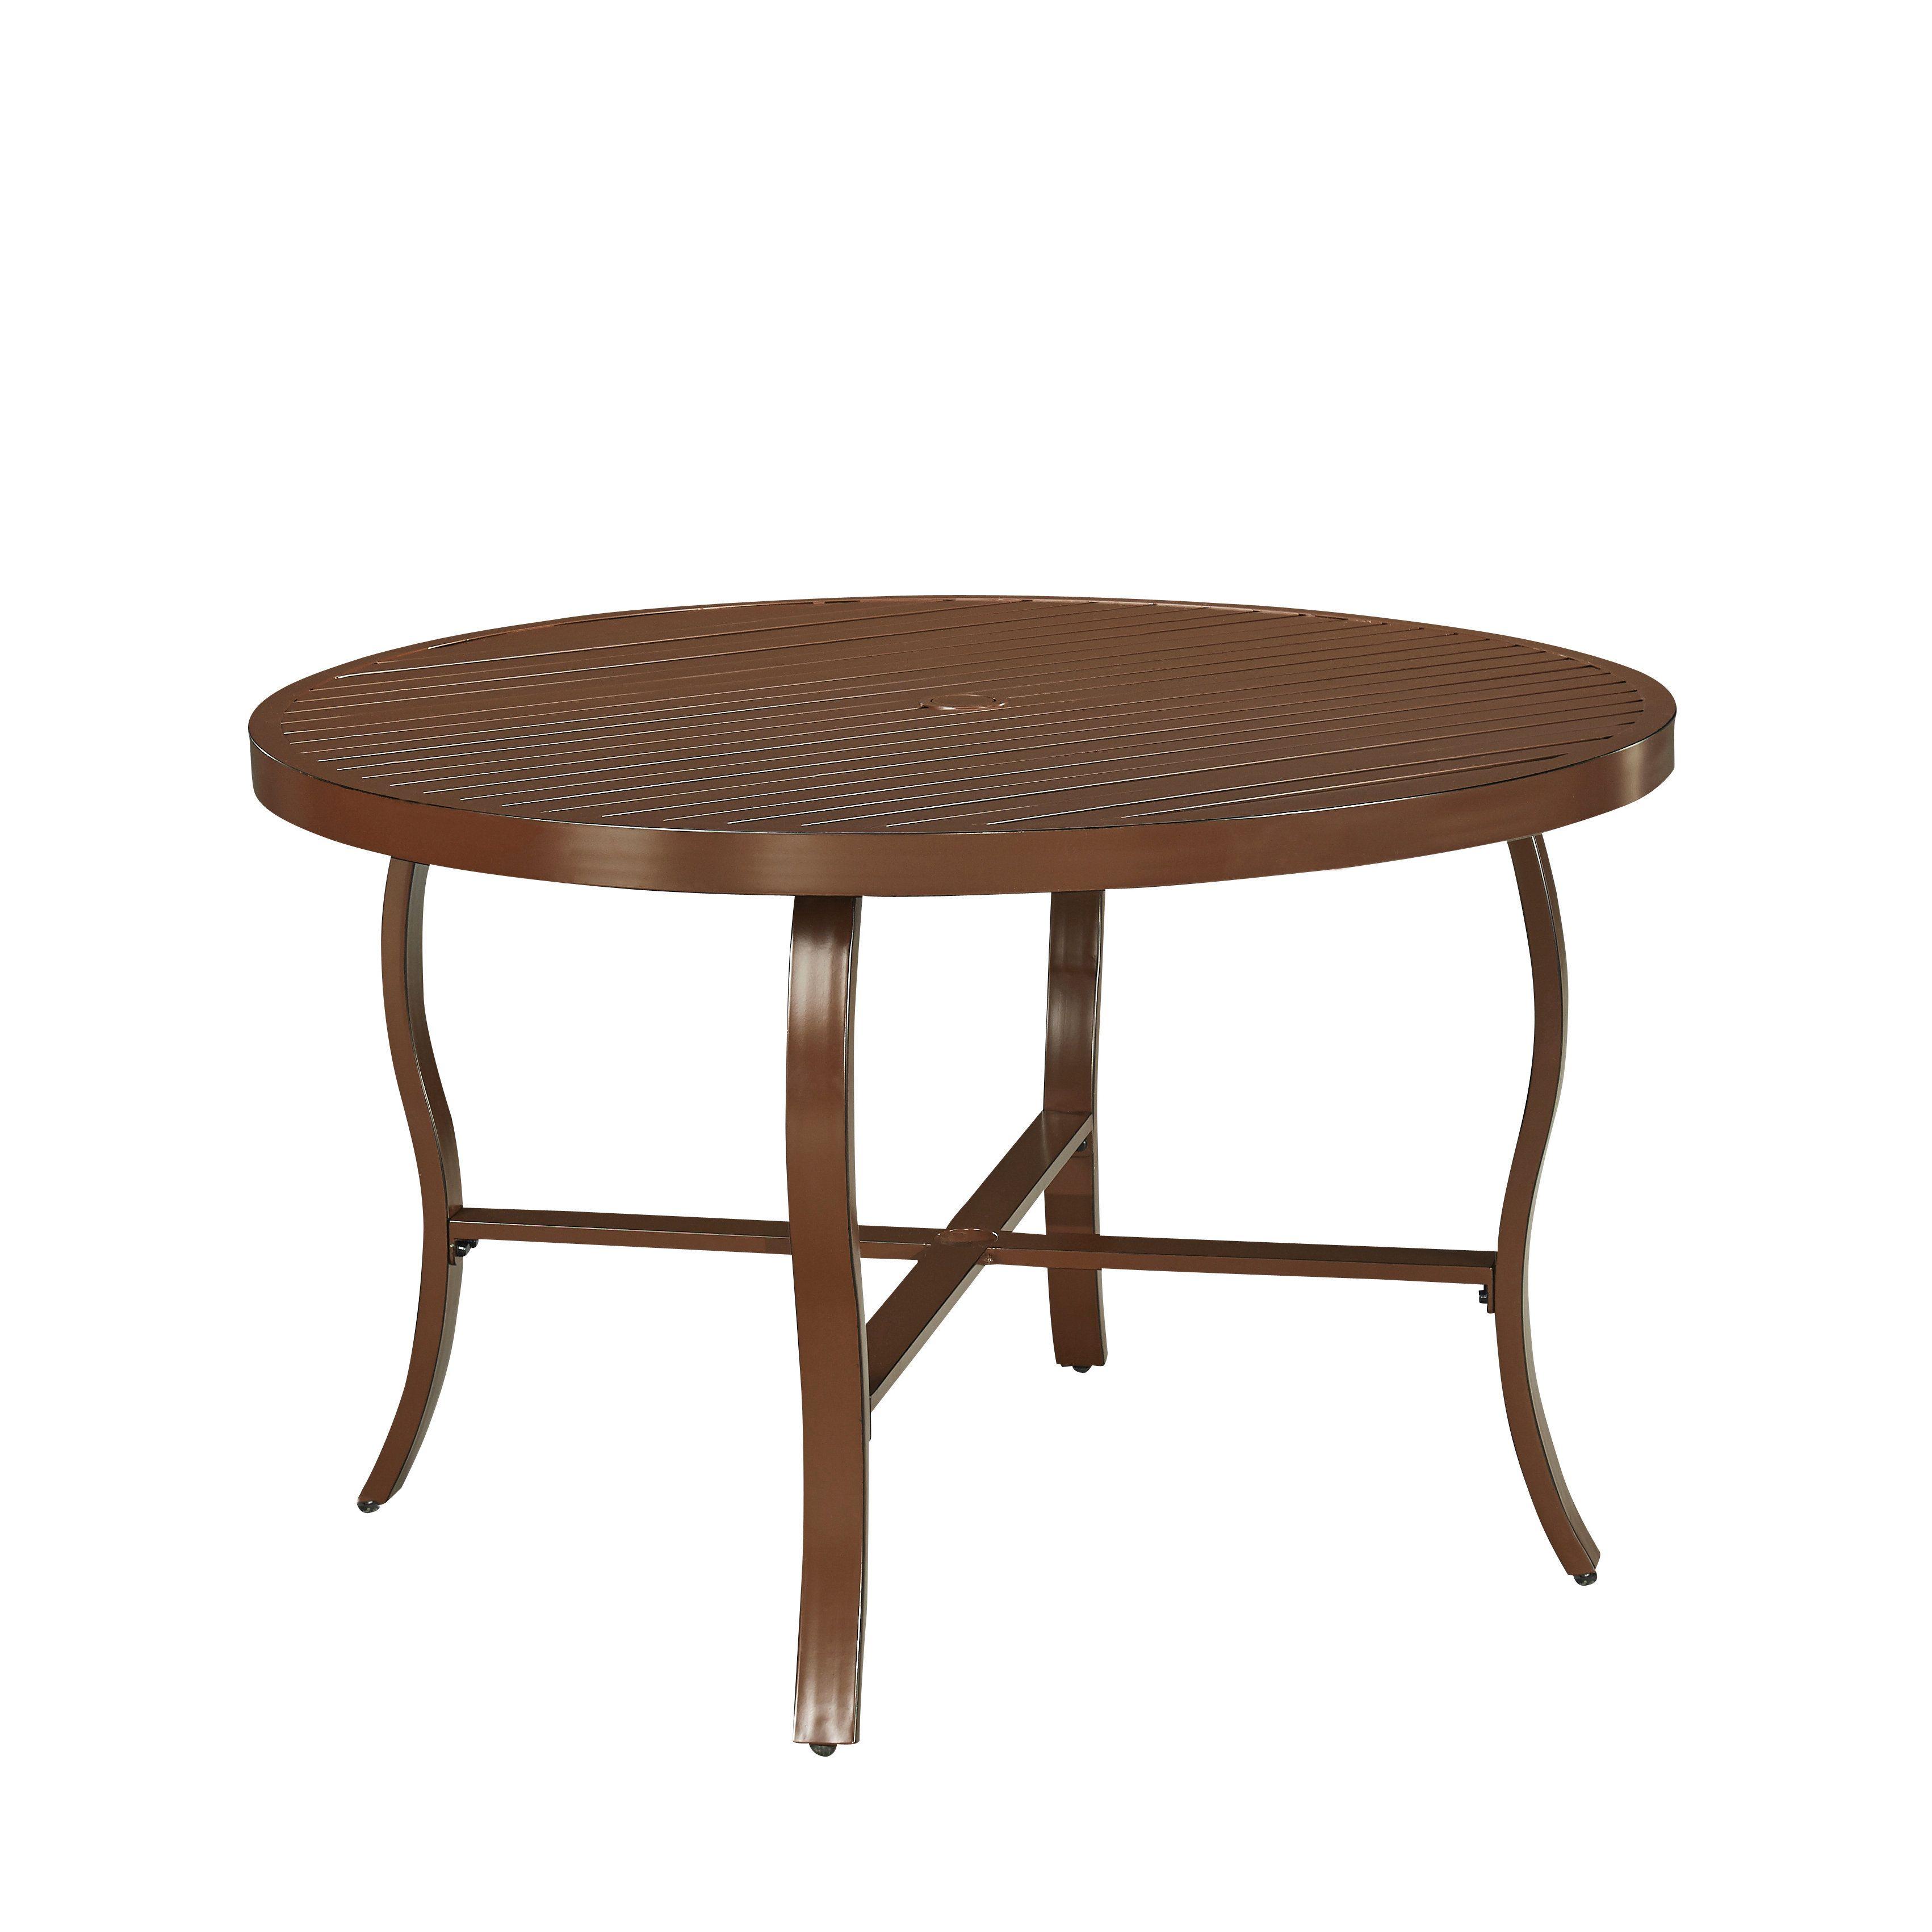 seater products furniture range img maxi yakoe set grey bistro patio eton two df